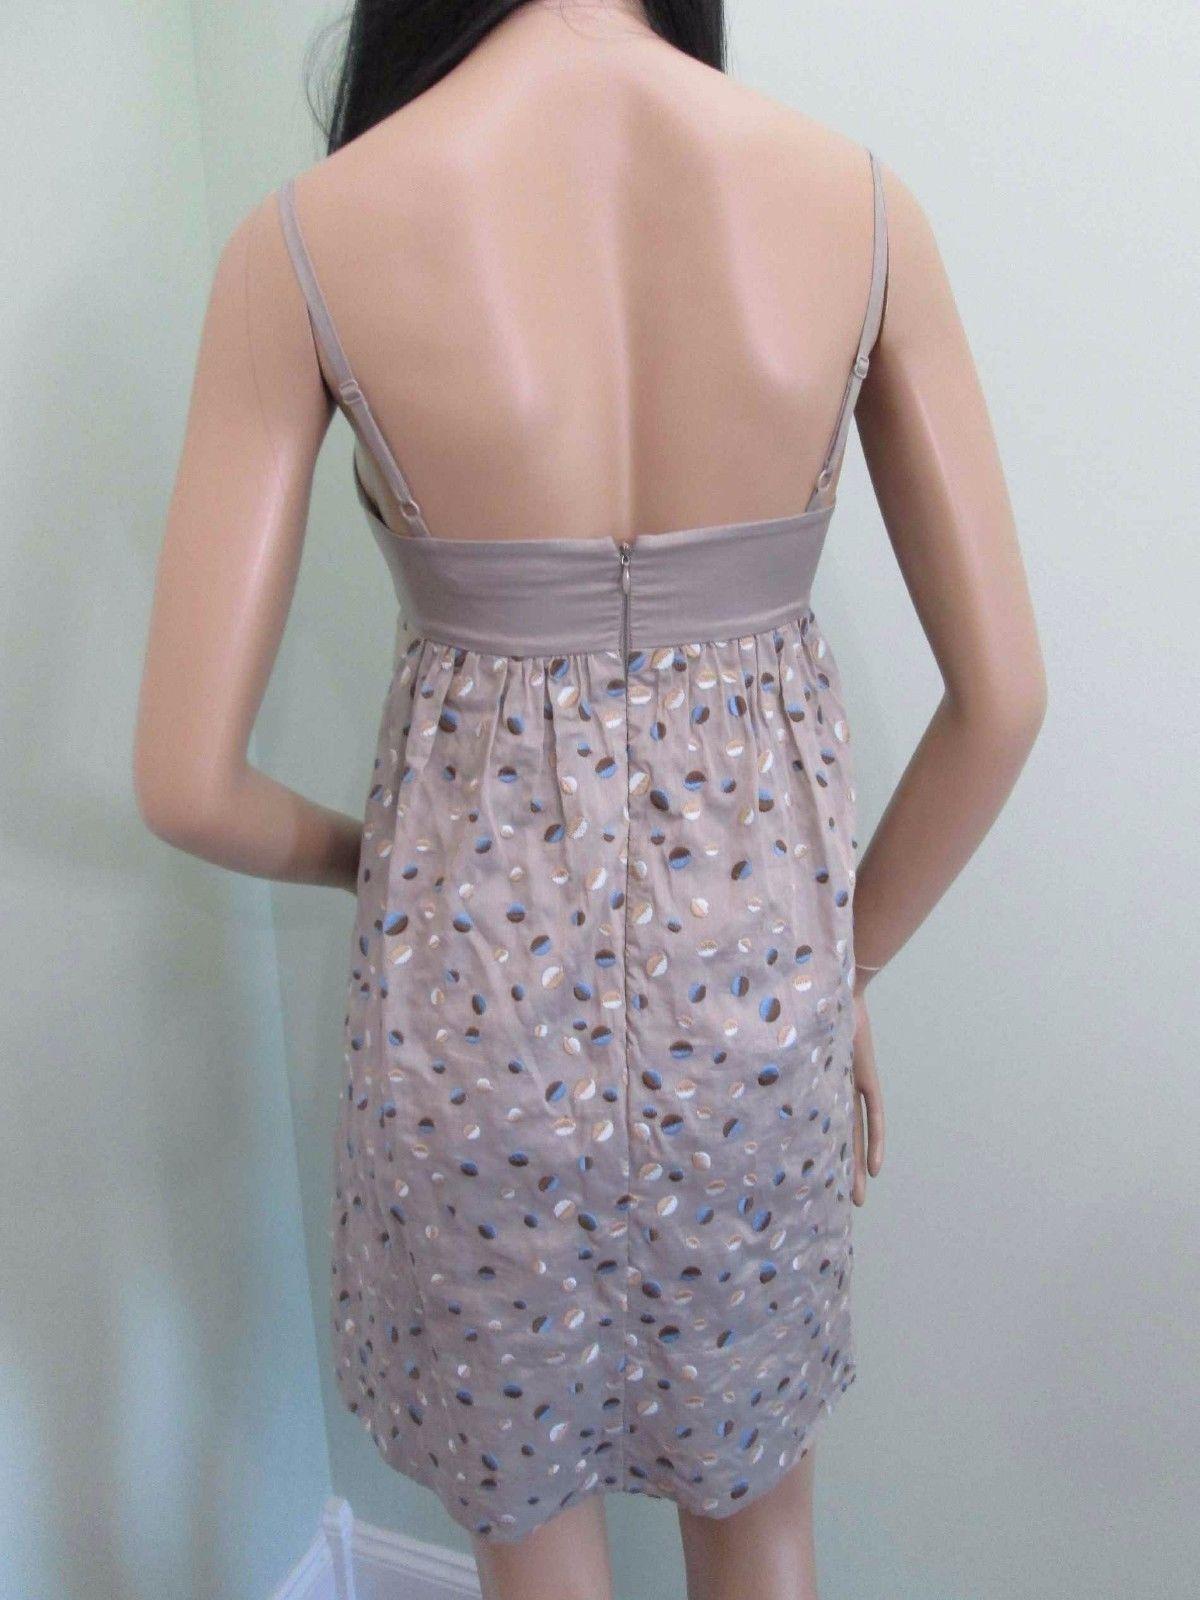 BCBG MAXAZRIA textured cotton woven babydoll tan dress $240 size 4 NEW